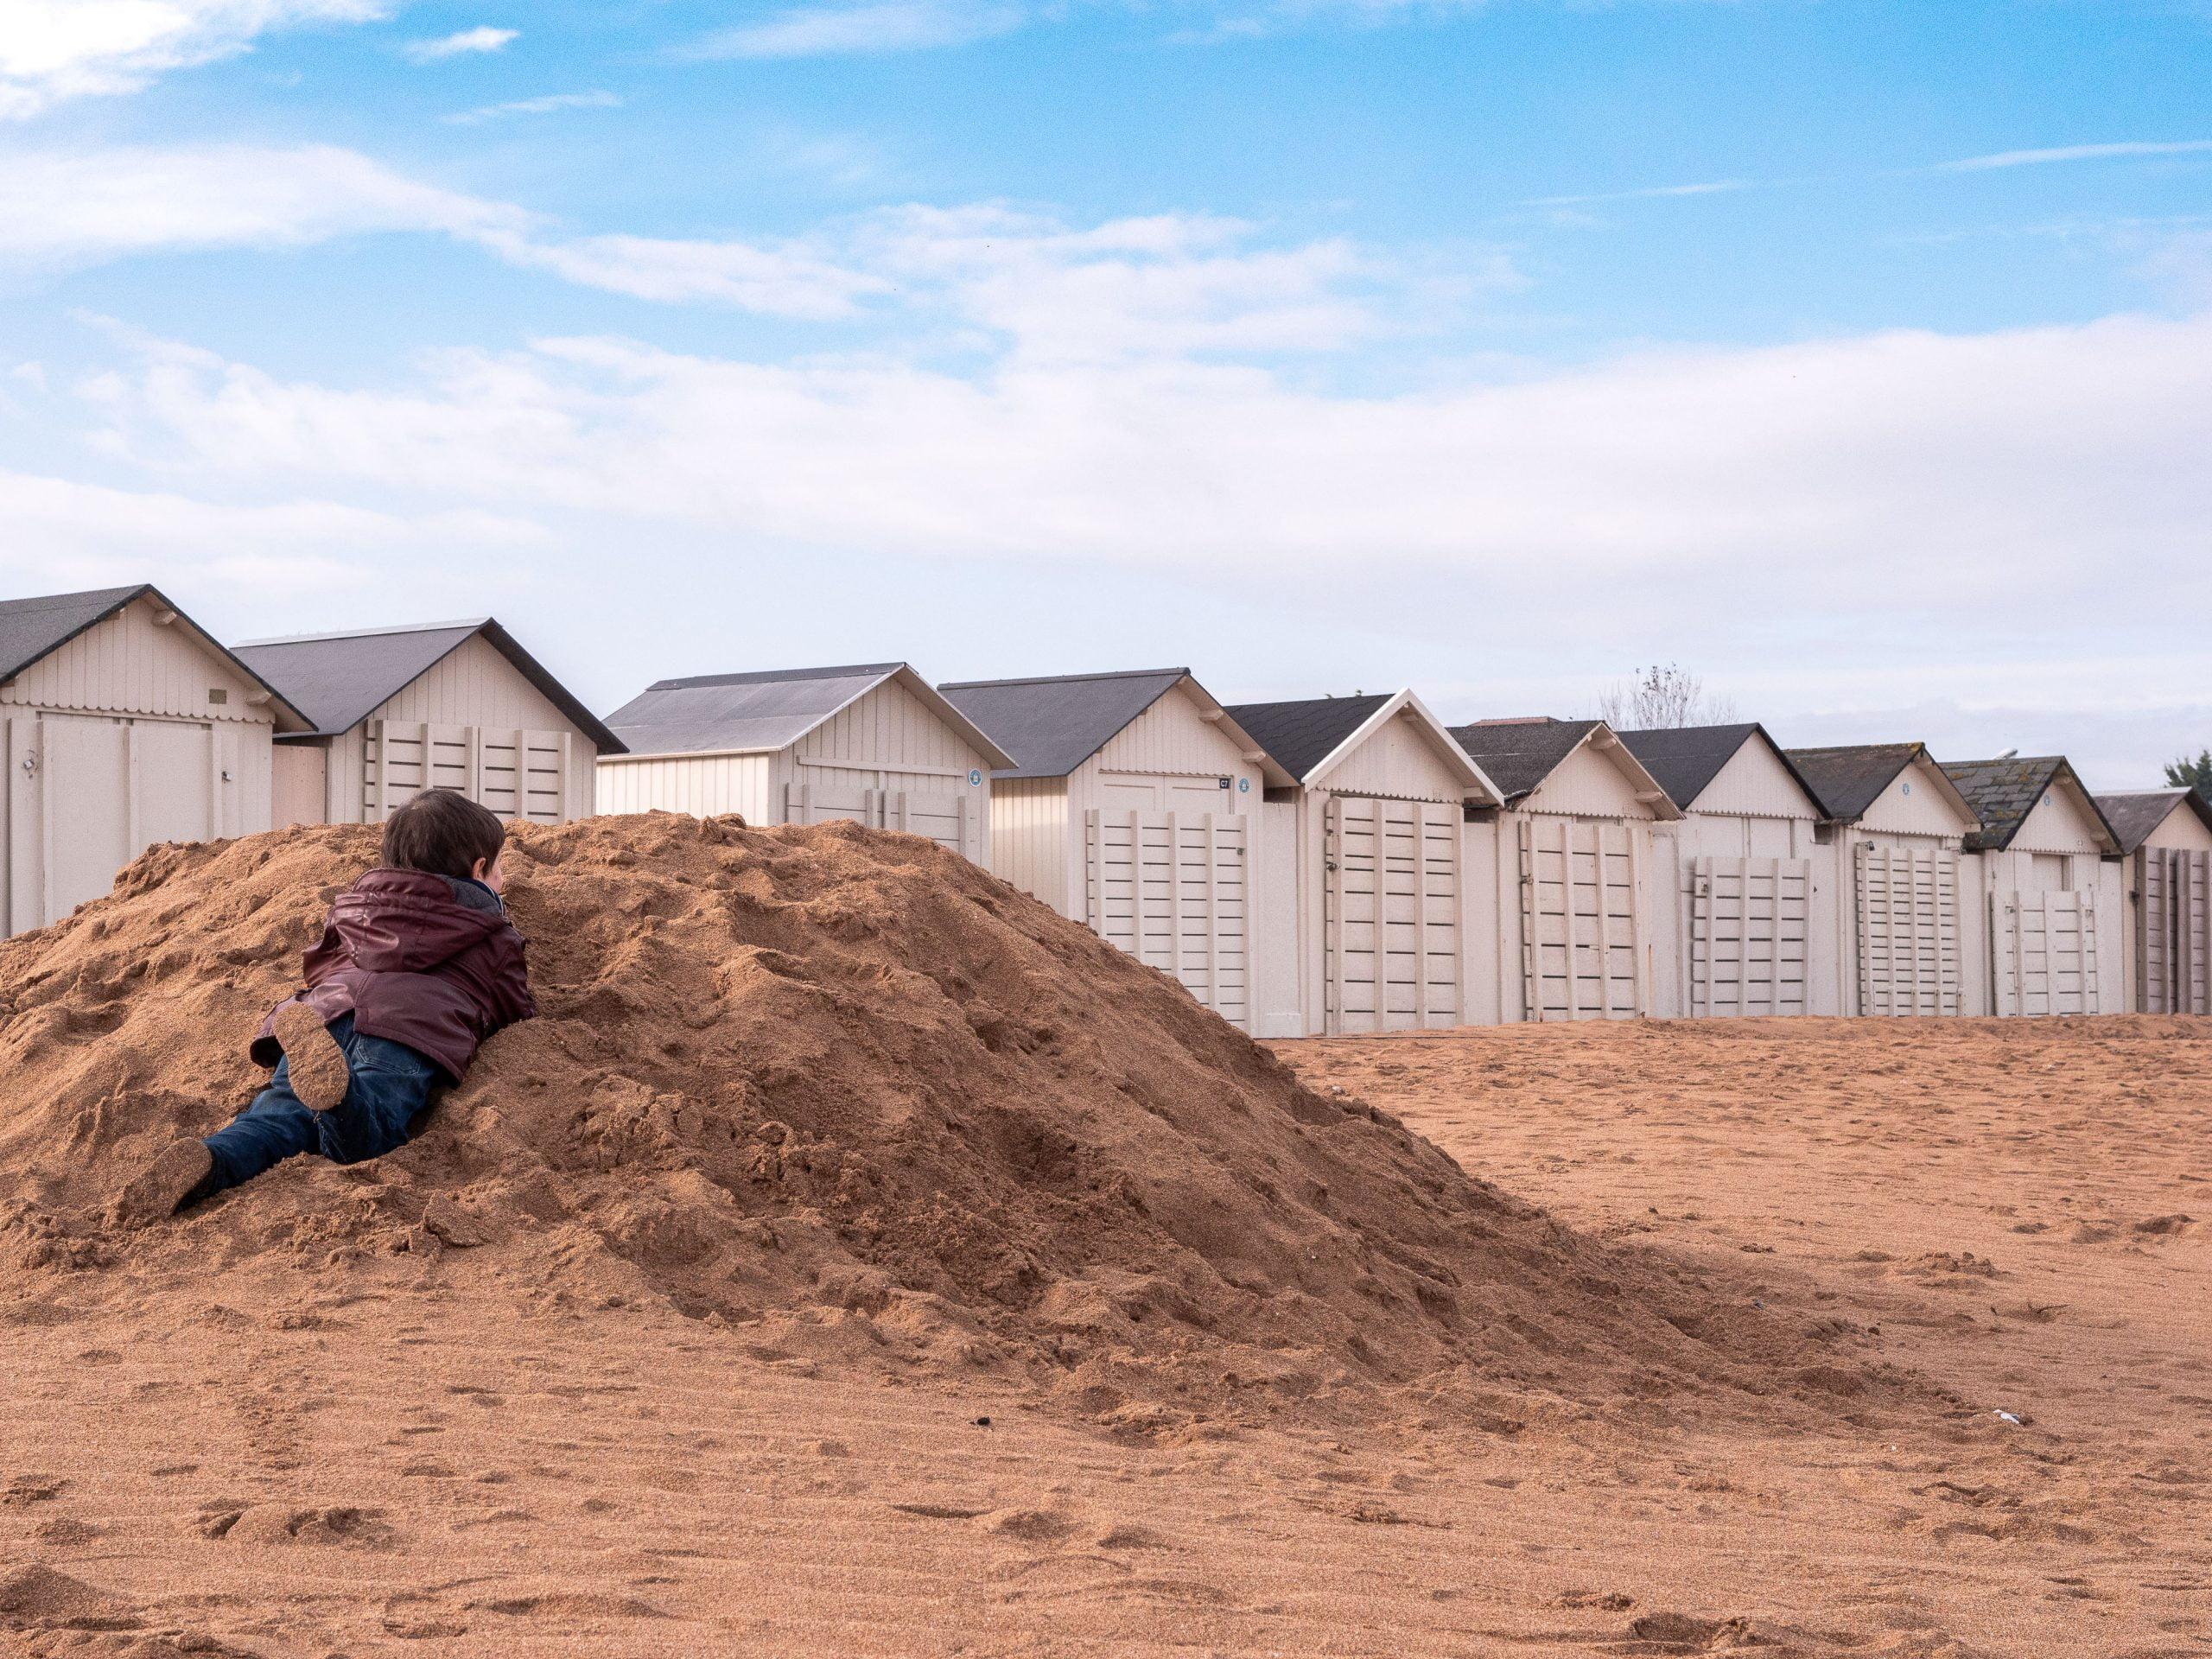 ouistreham cabane cachette scaled - Les globe blogueurs - blog voyage nature